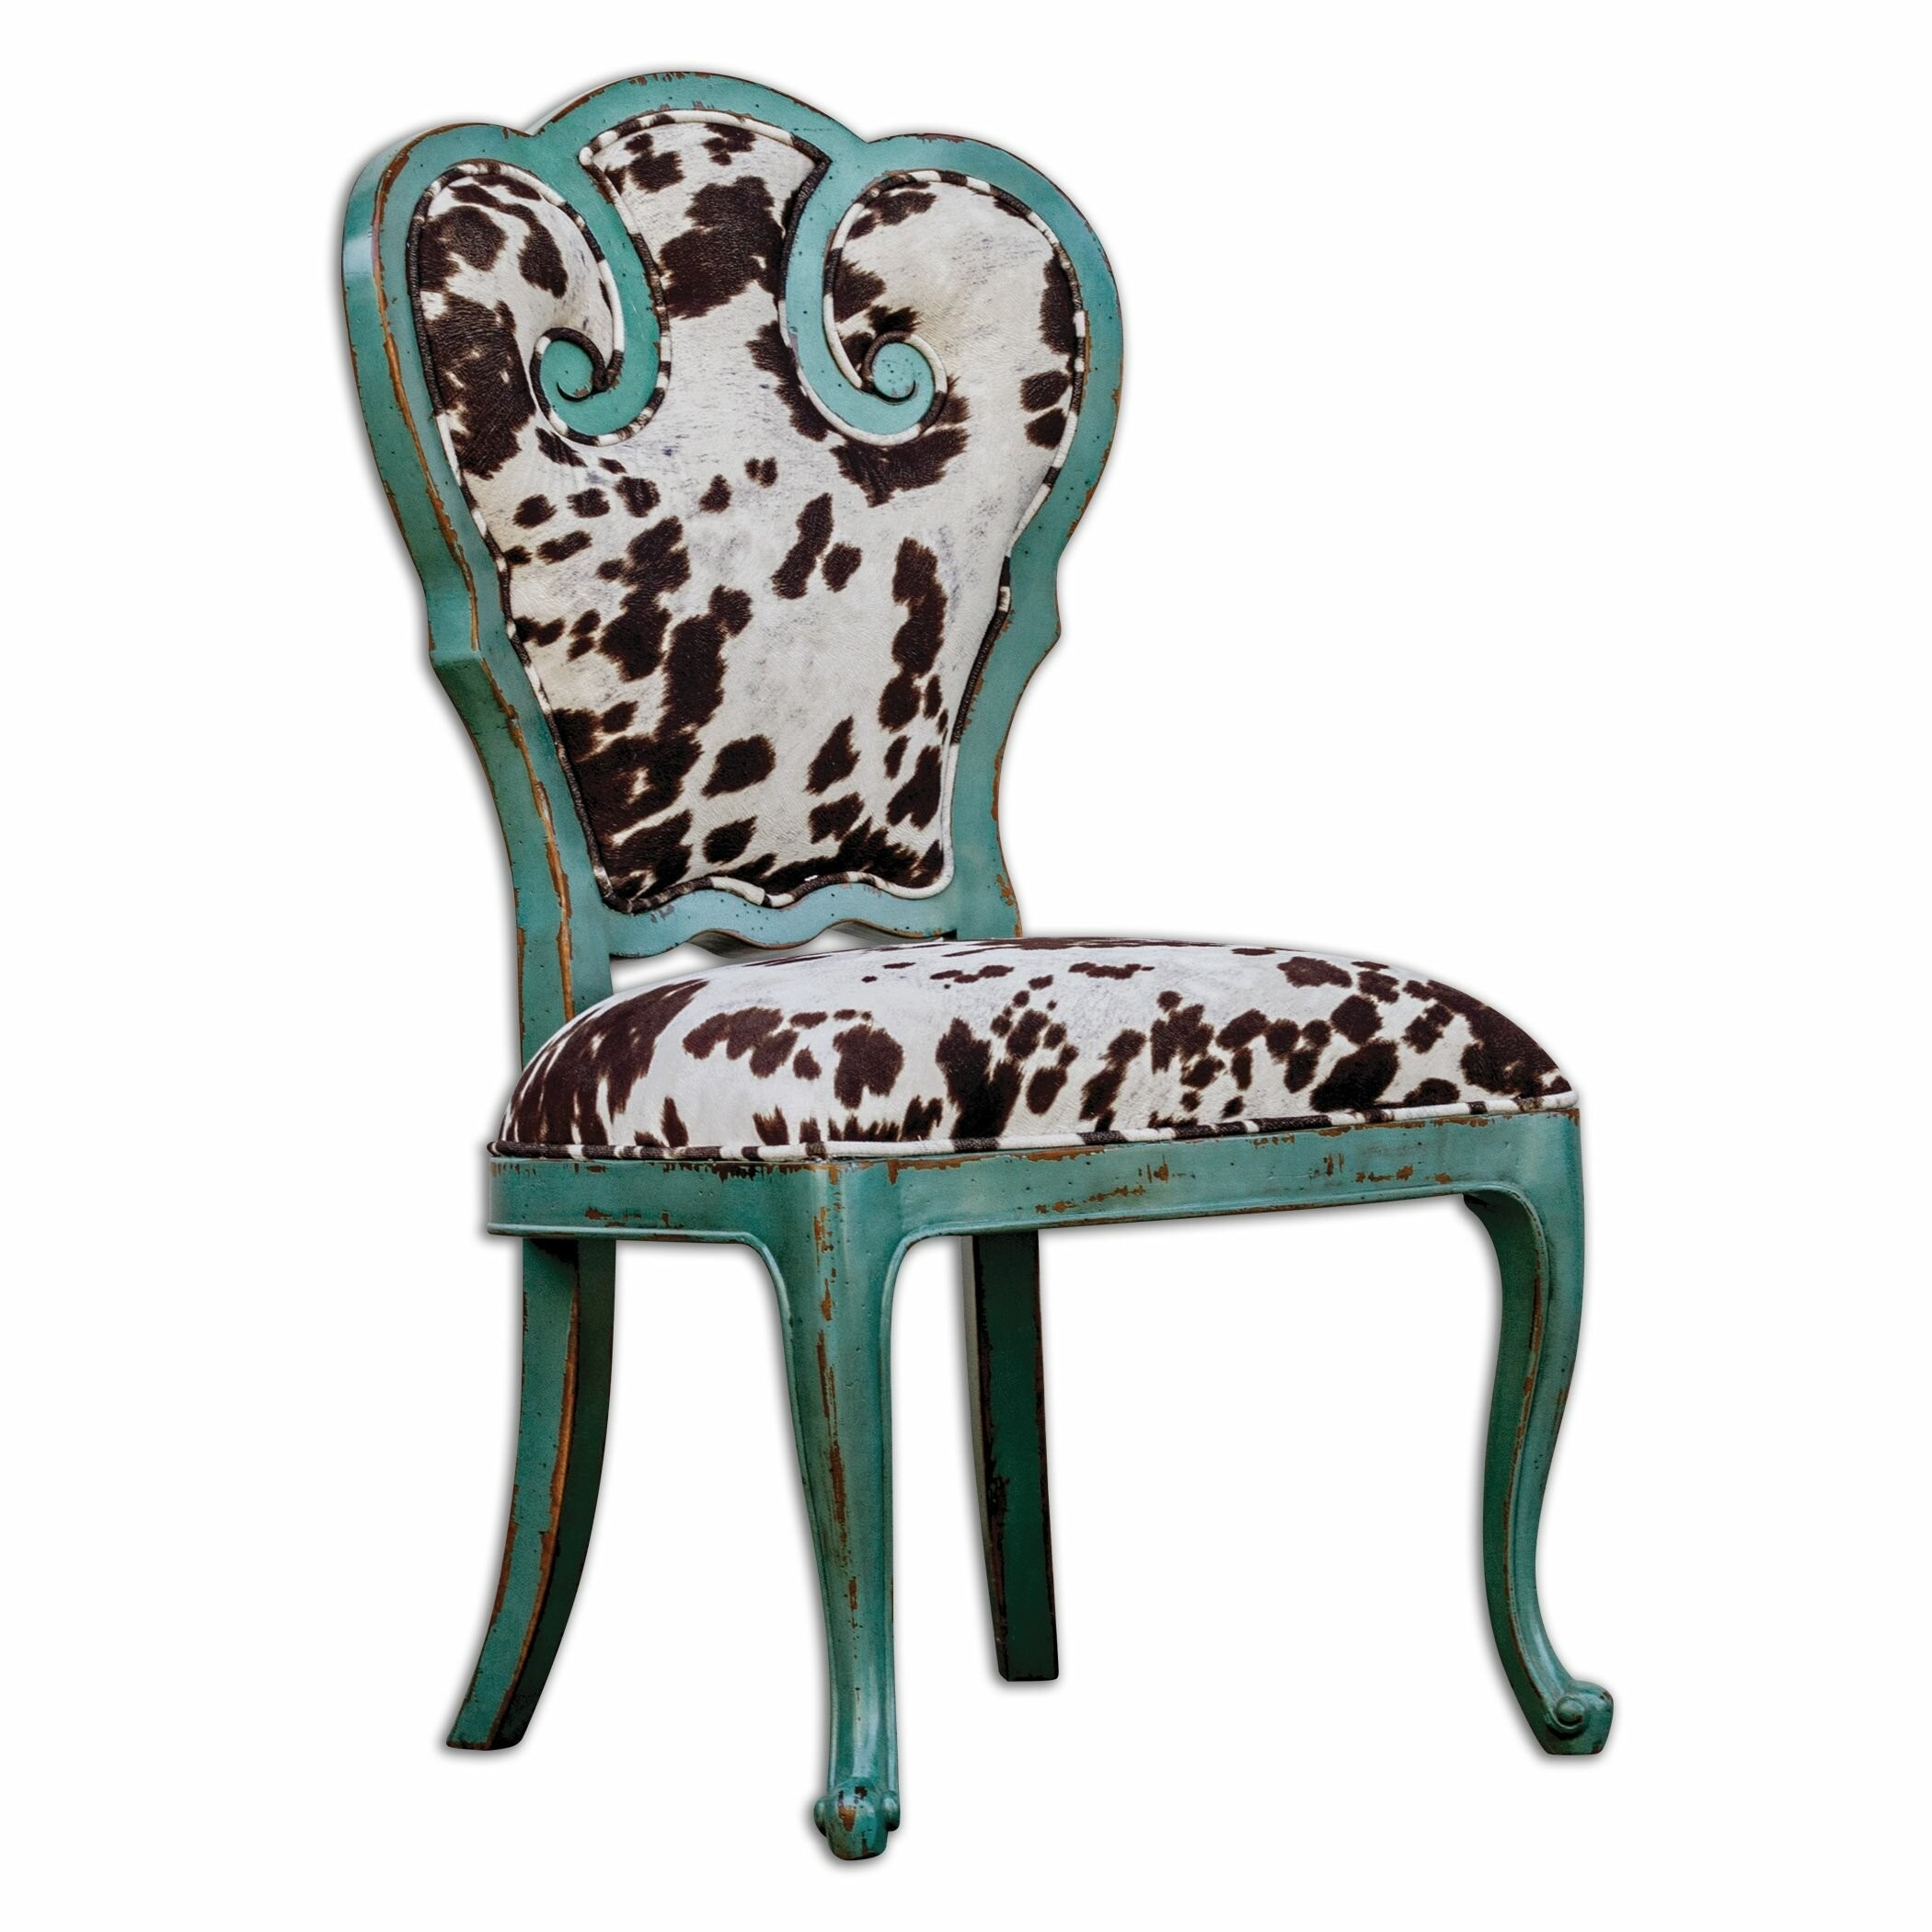 Amazing Retro Aqua Blue Scroll Side Chair With Cow Print Cushion